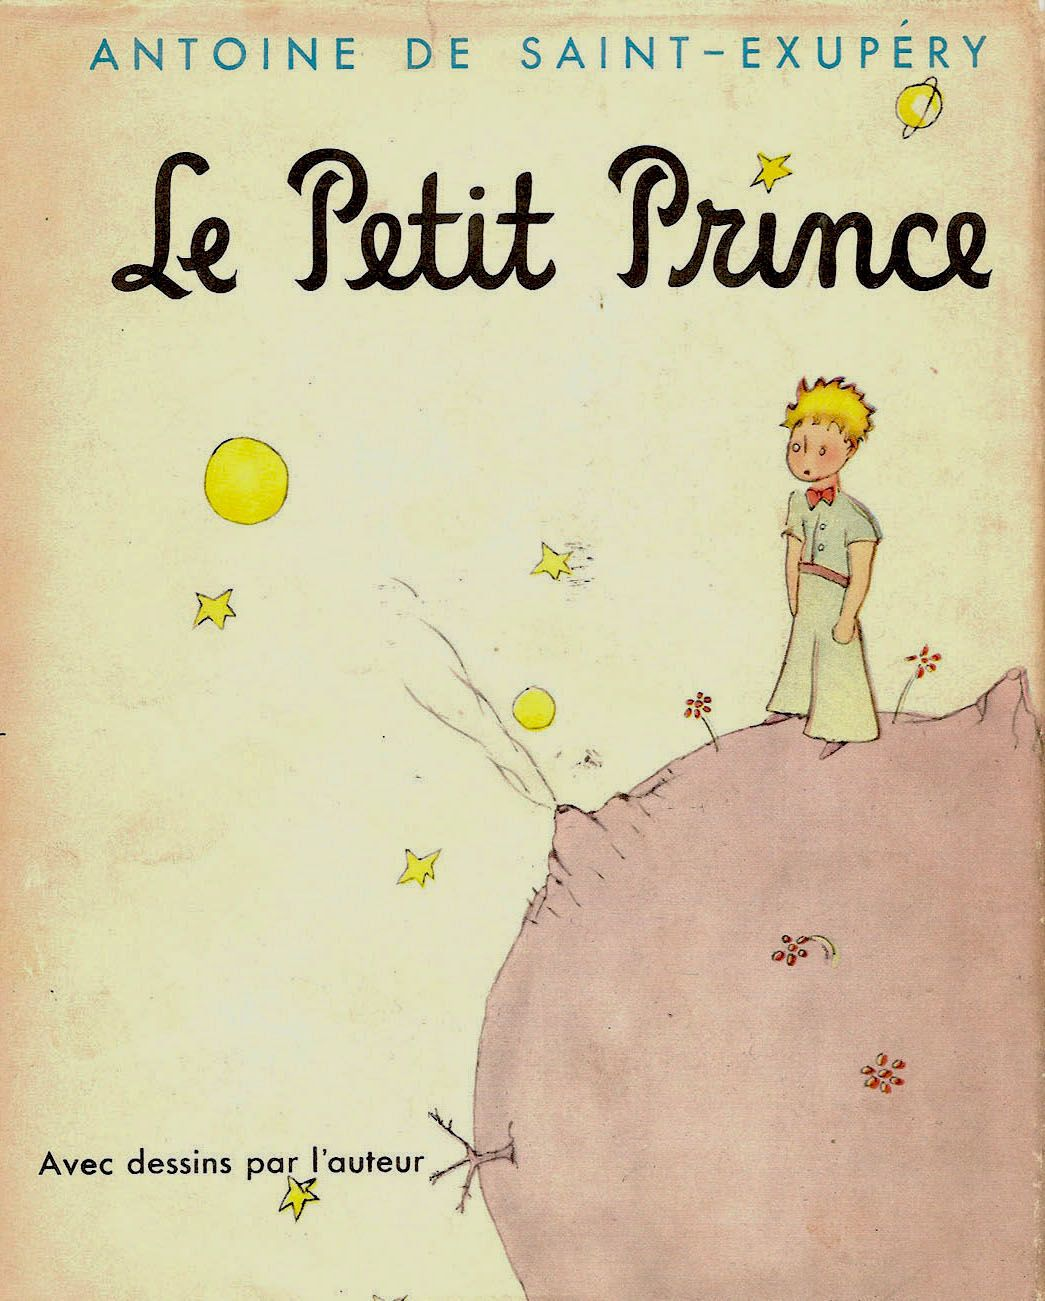 24 book essay - The Little Prince - priyanka kumar 2